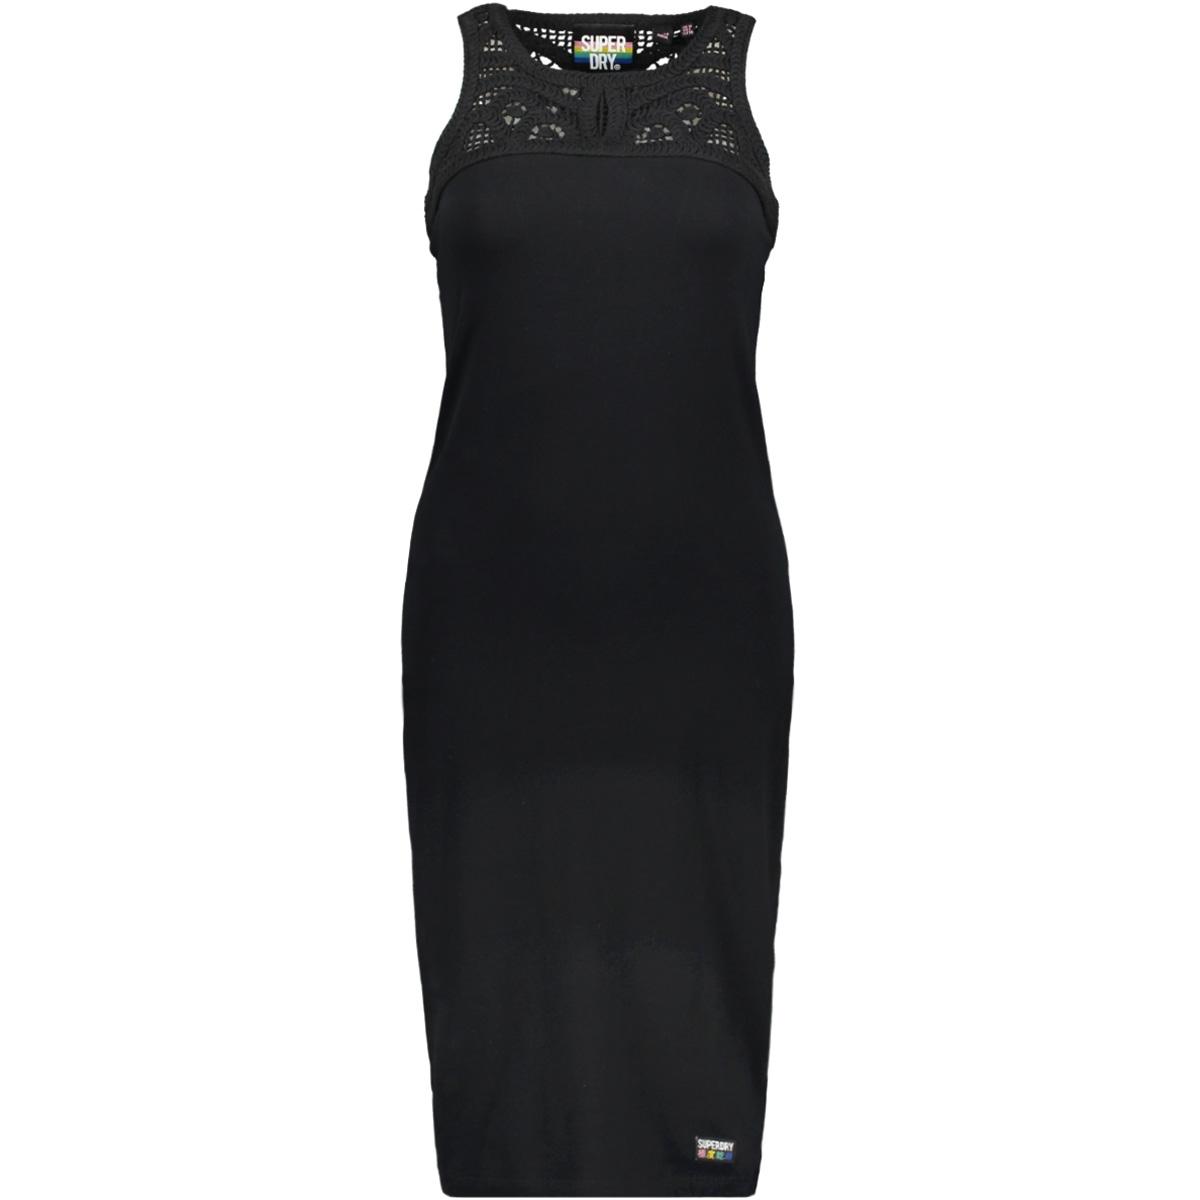 e50d207b1da5e0 jessie macramie midi g80207ru superdry jurk black